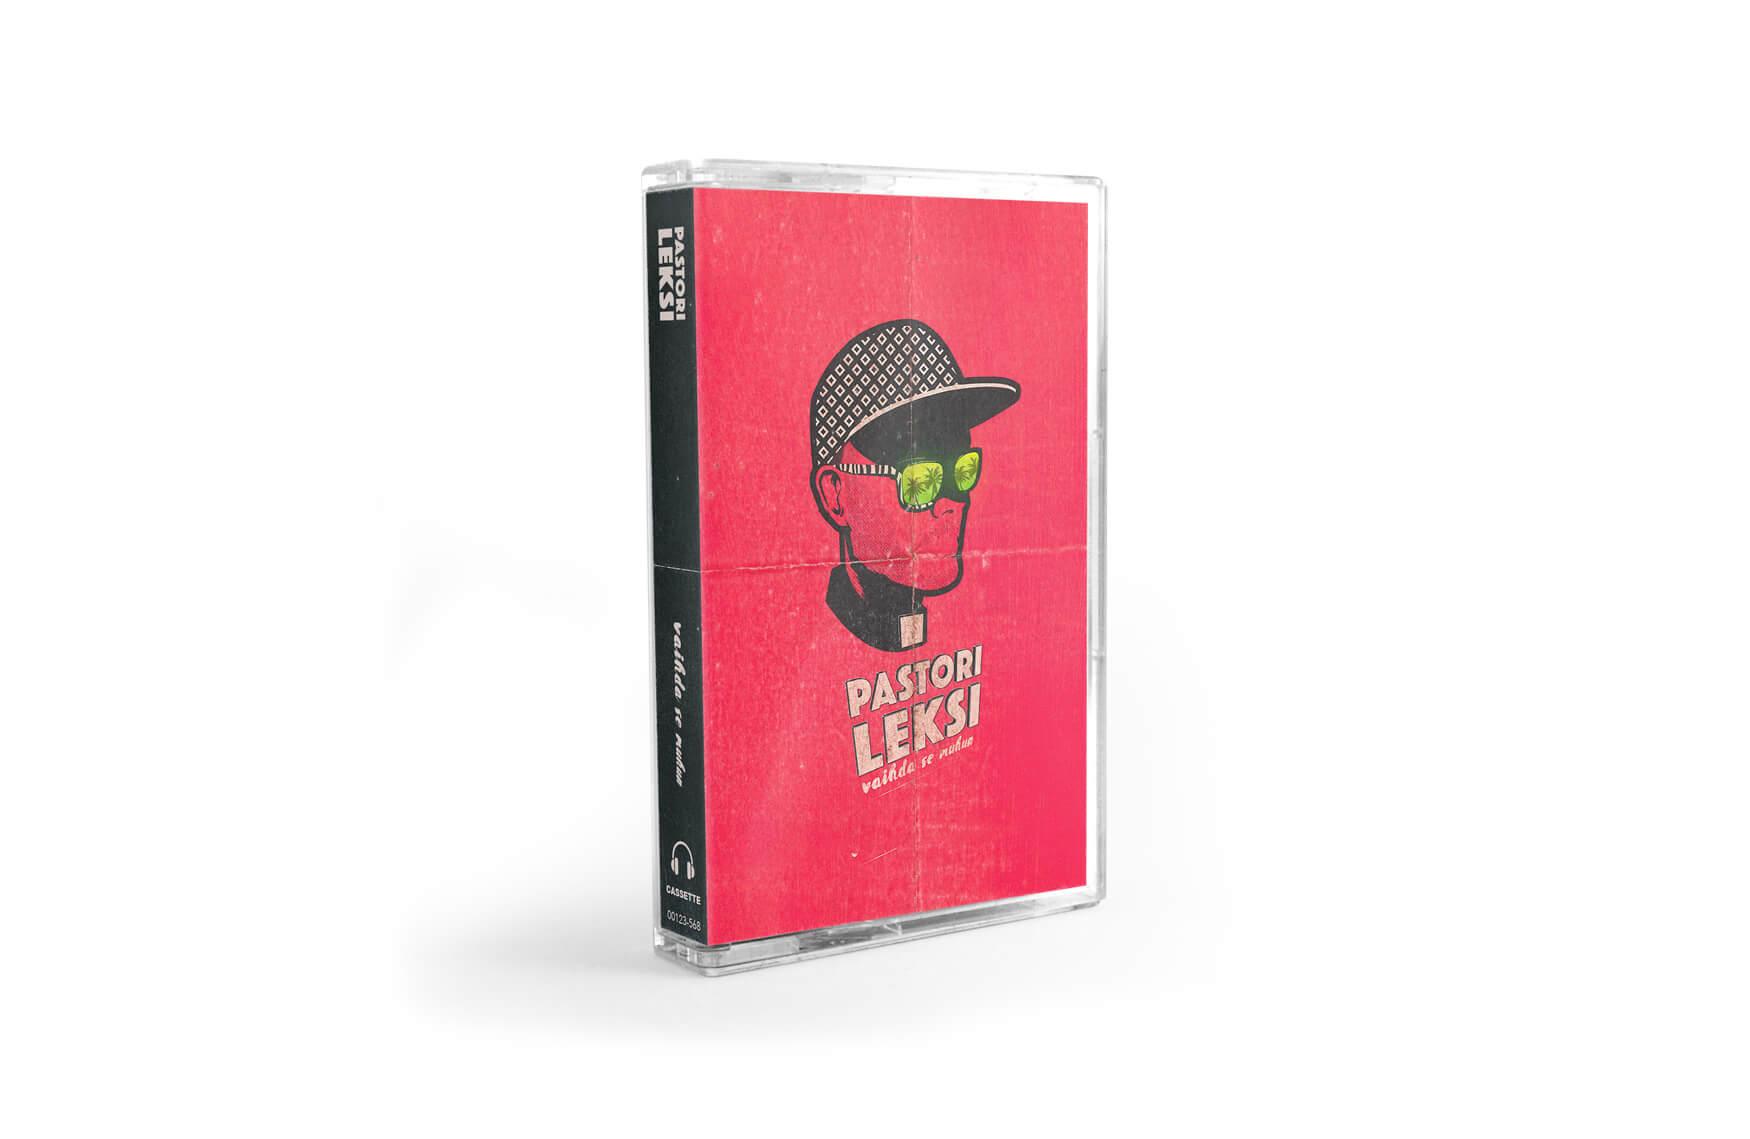 pastori-cassette